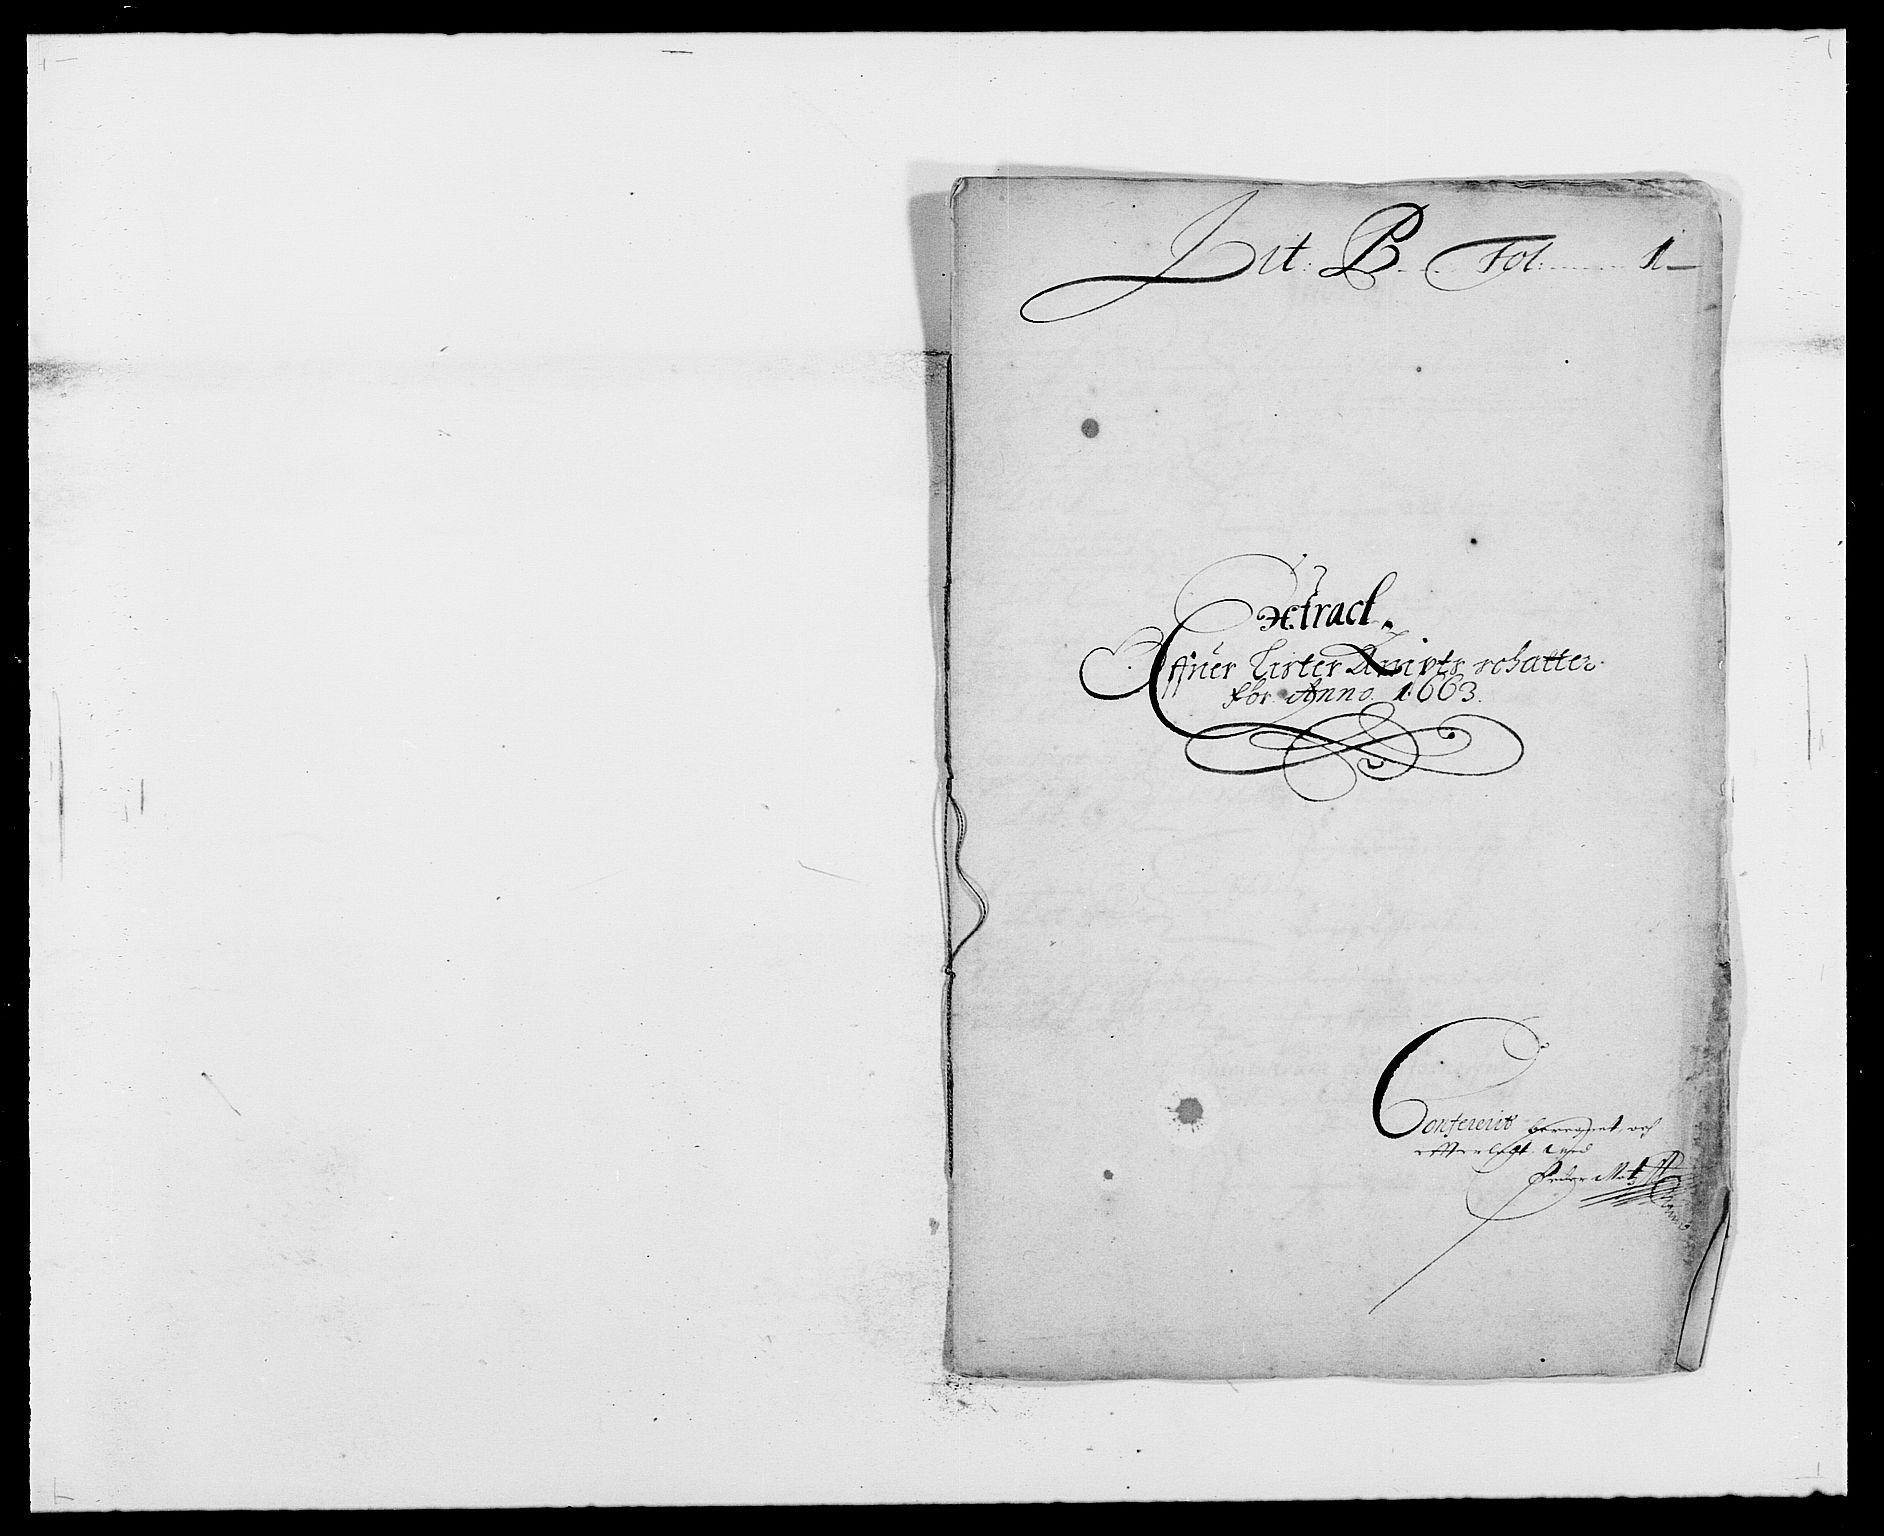 RA, Rentekammeret inntil 1814, Reviderte regnskaper, Fogderegnskap, R41/L2523: Fogderegnskap Lista, 1663-1664, s. 16